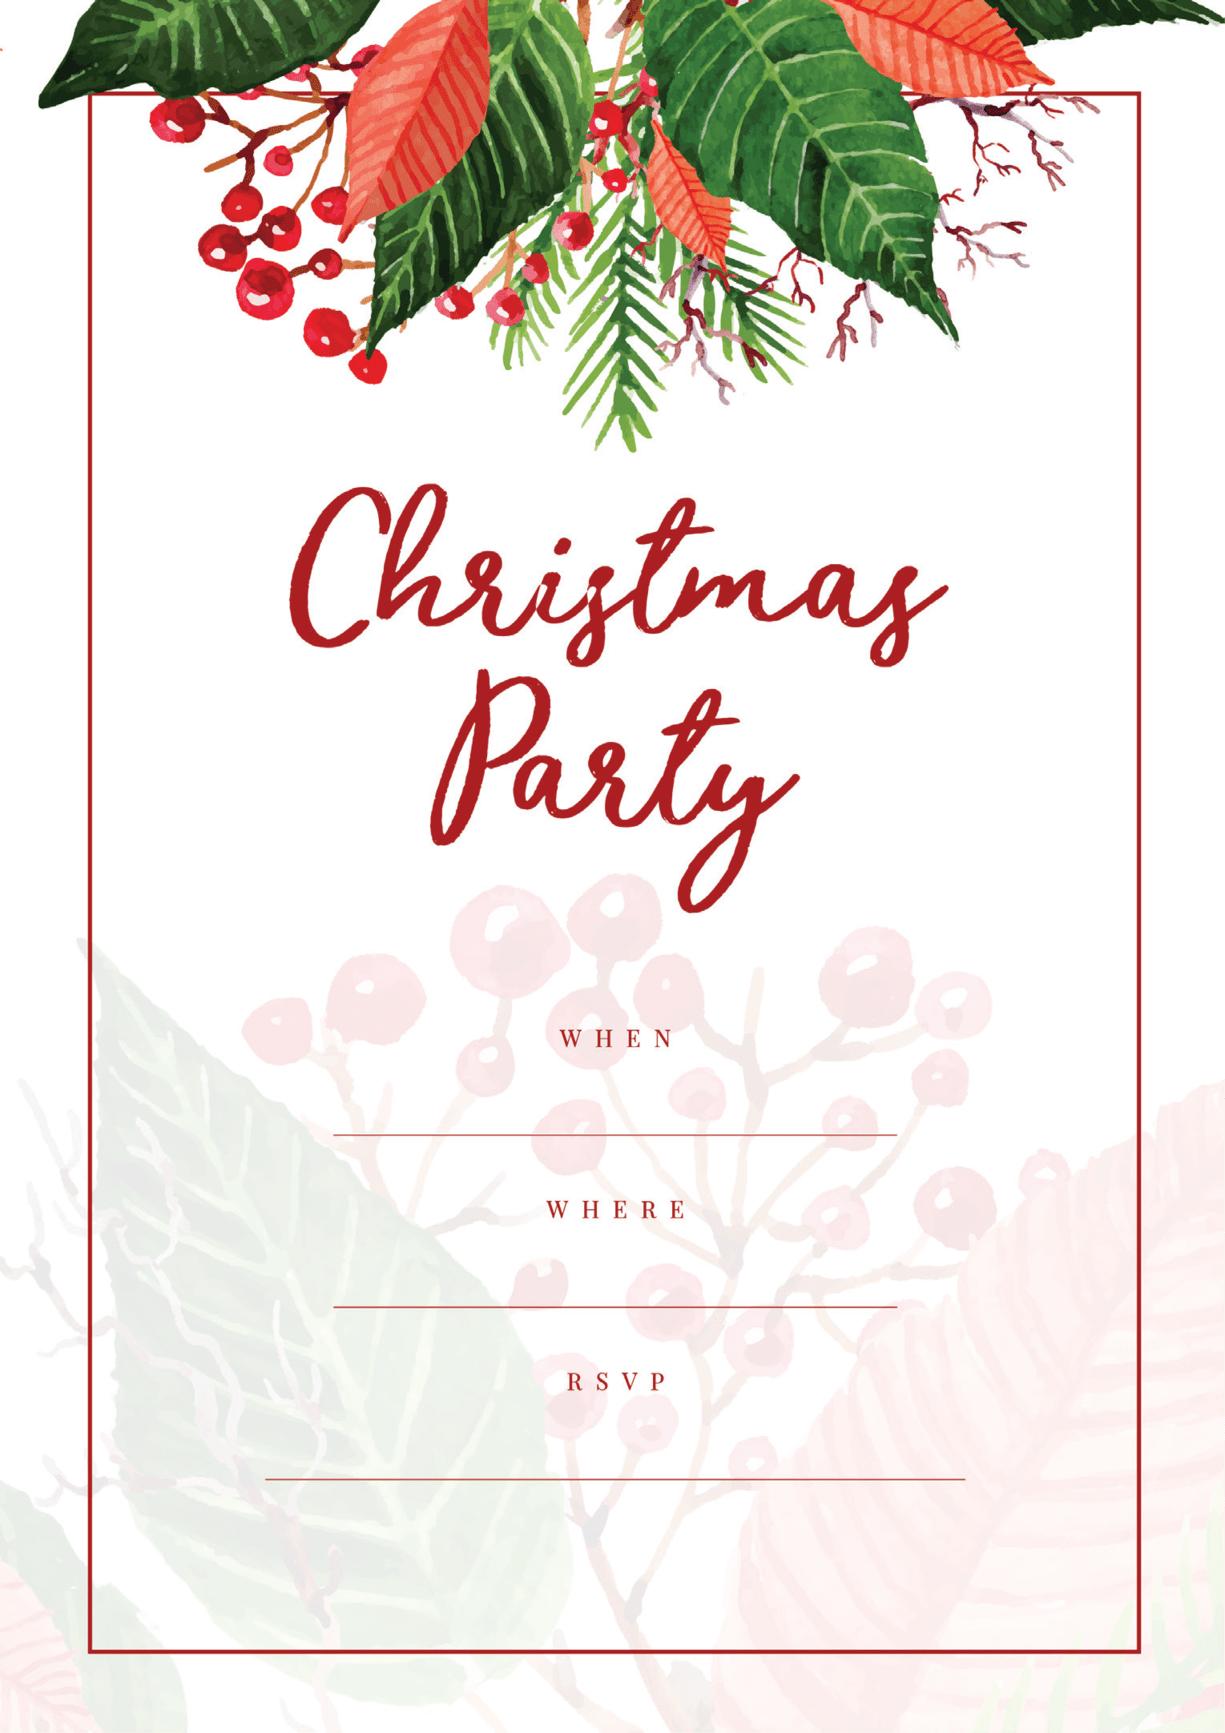 Free Holiday Party Invitations - All Free Invitations